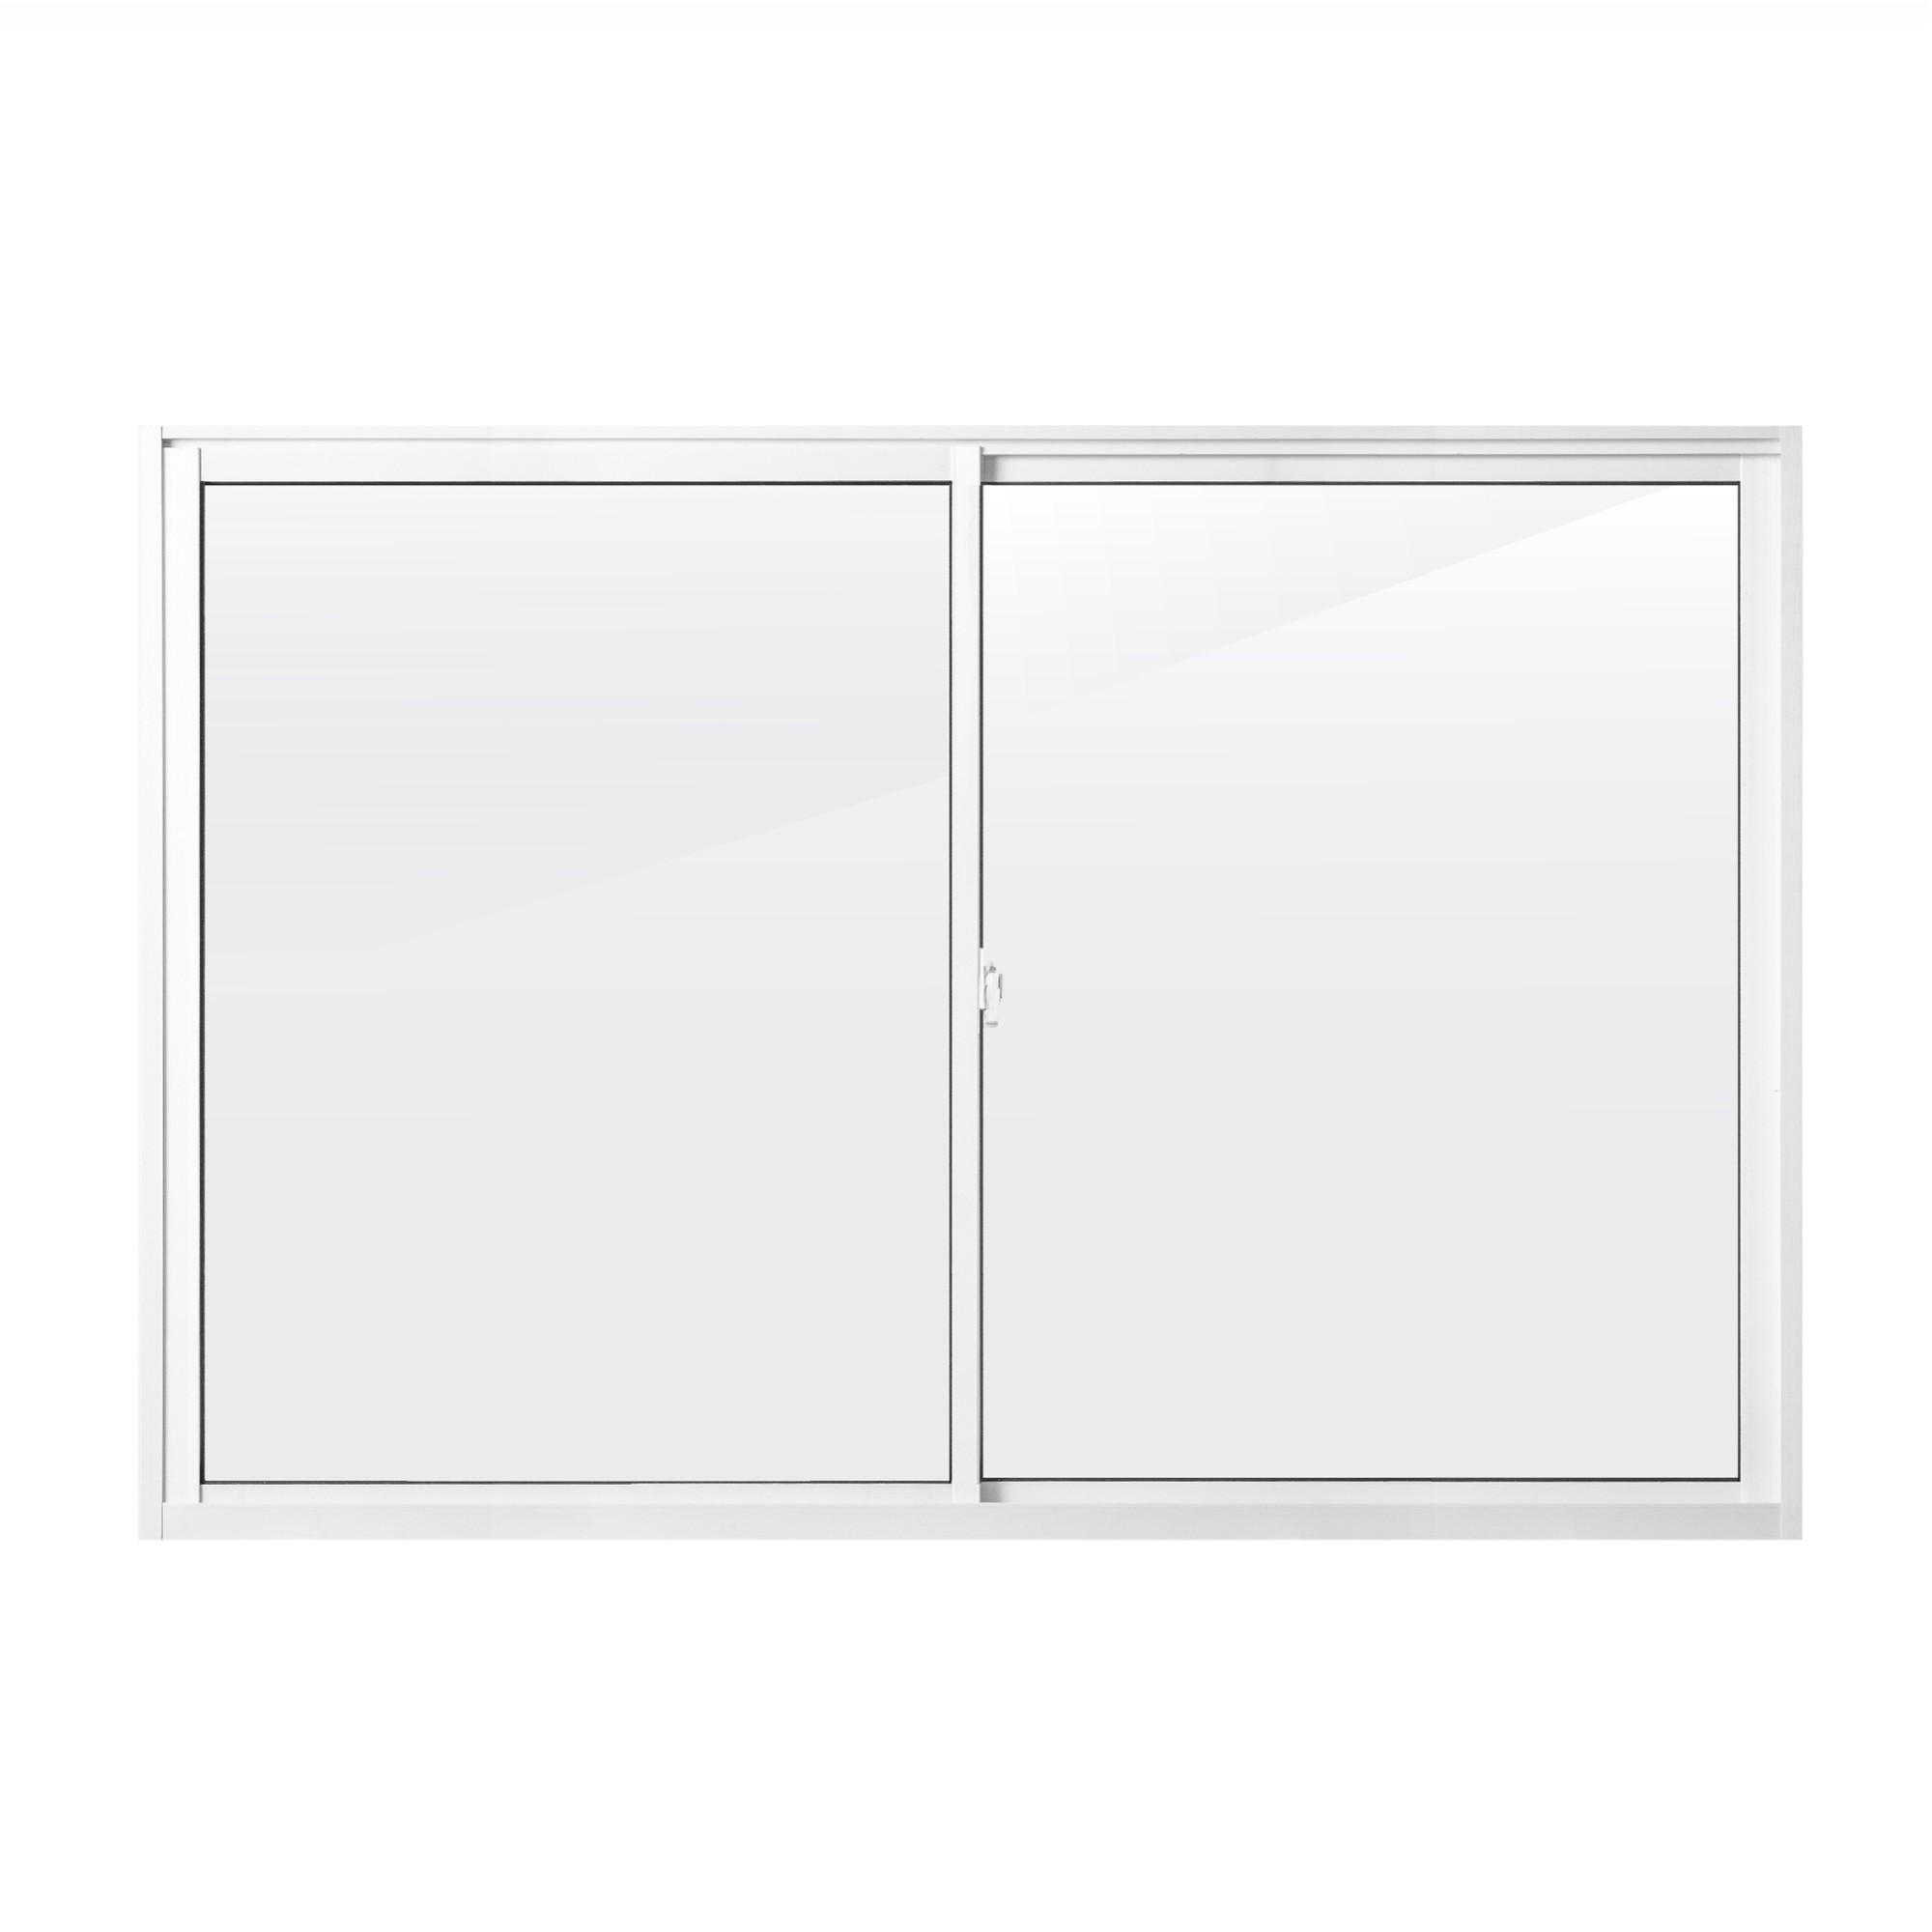 Janela de Correr de Aluminio 2 Folhas 100x150 cm Metalflex - Aluvid